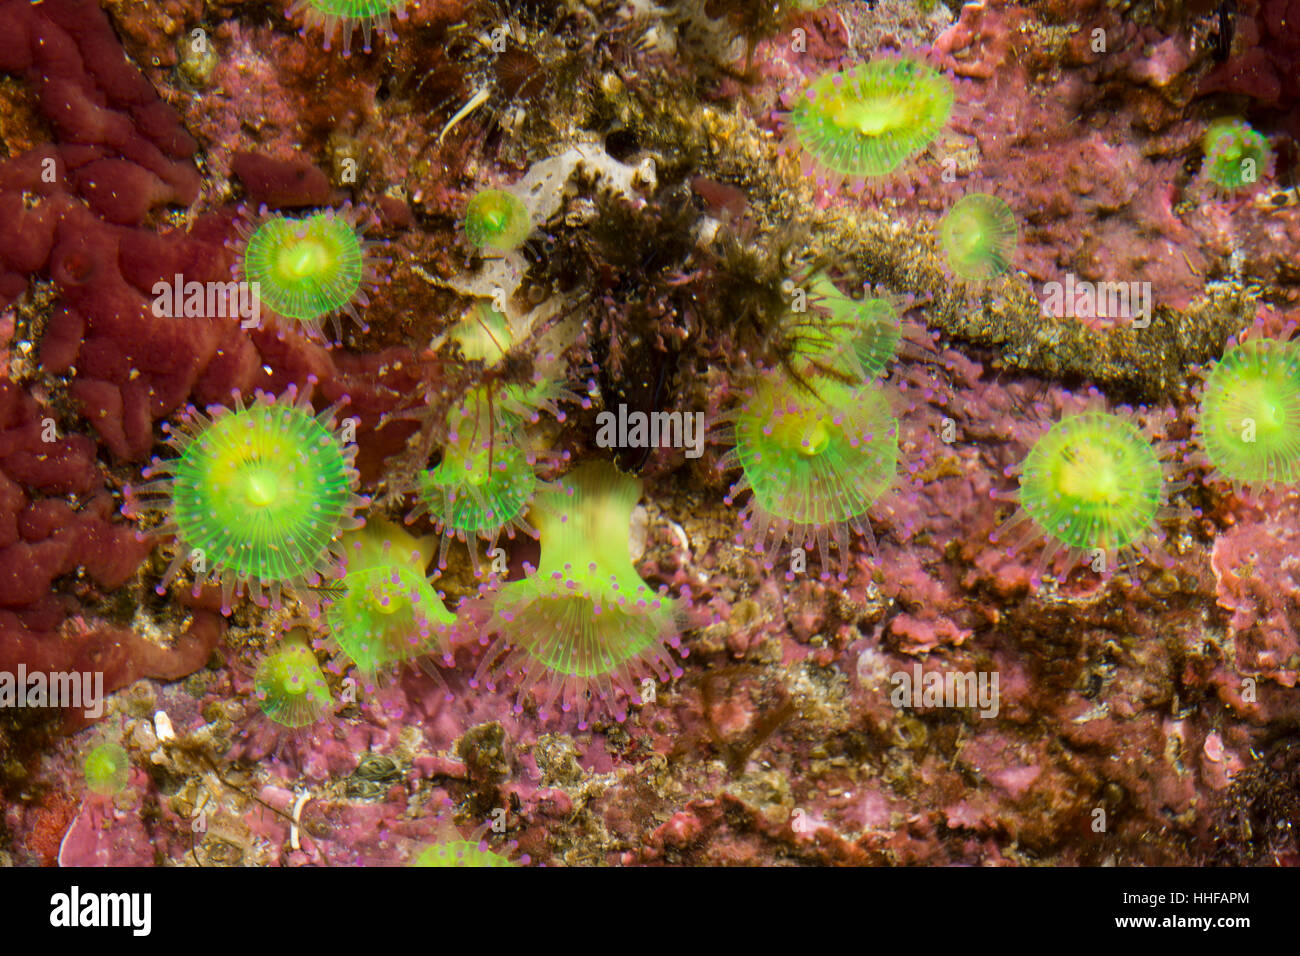 Juwelenanemone, Juwelen-Anemone, Korallenanemone, Korallen-Anemone, Corynactis viridis, jewel anemone, L'Anémone - Stock Image